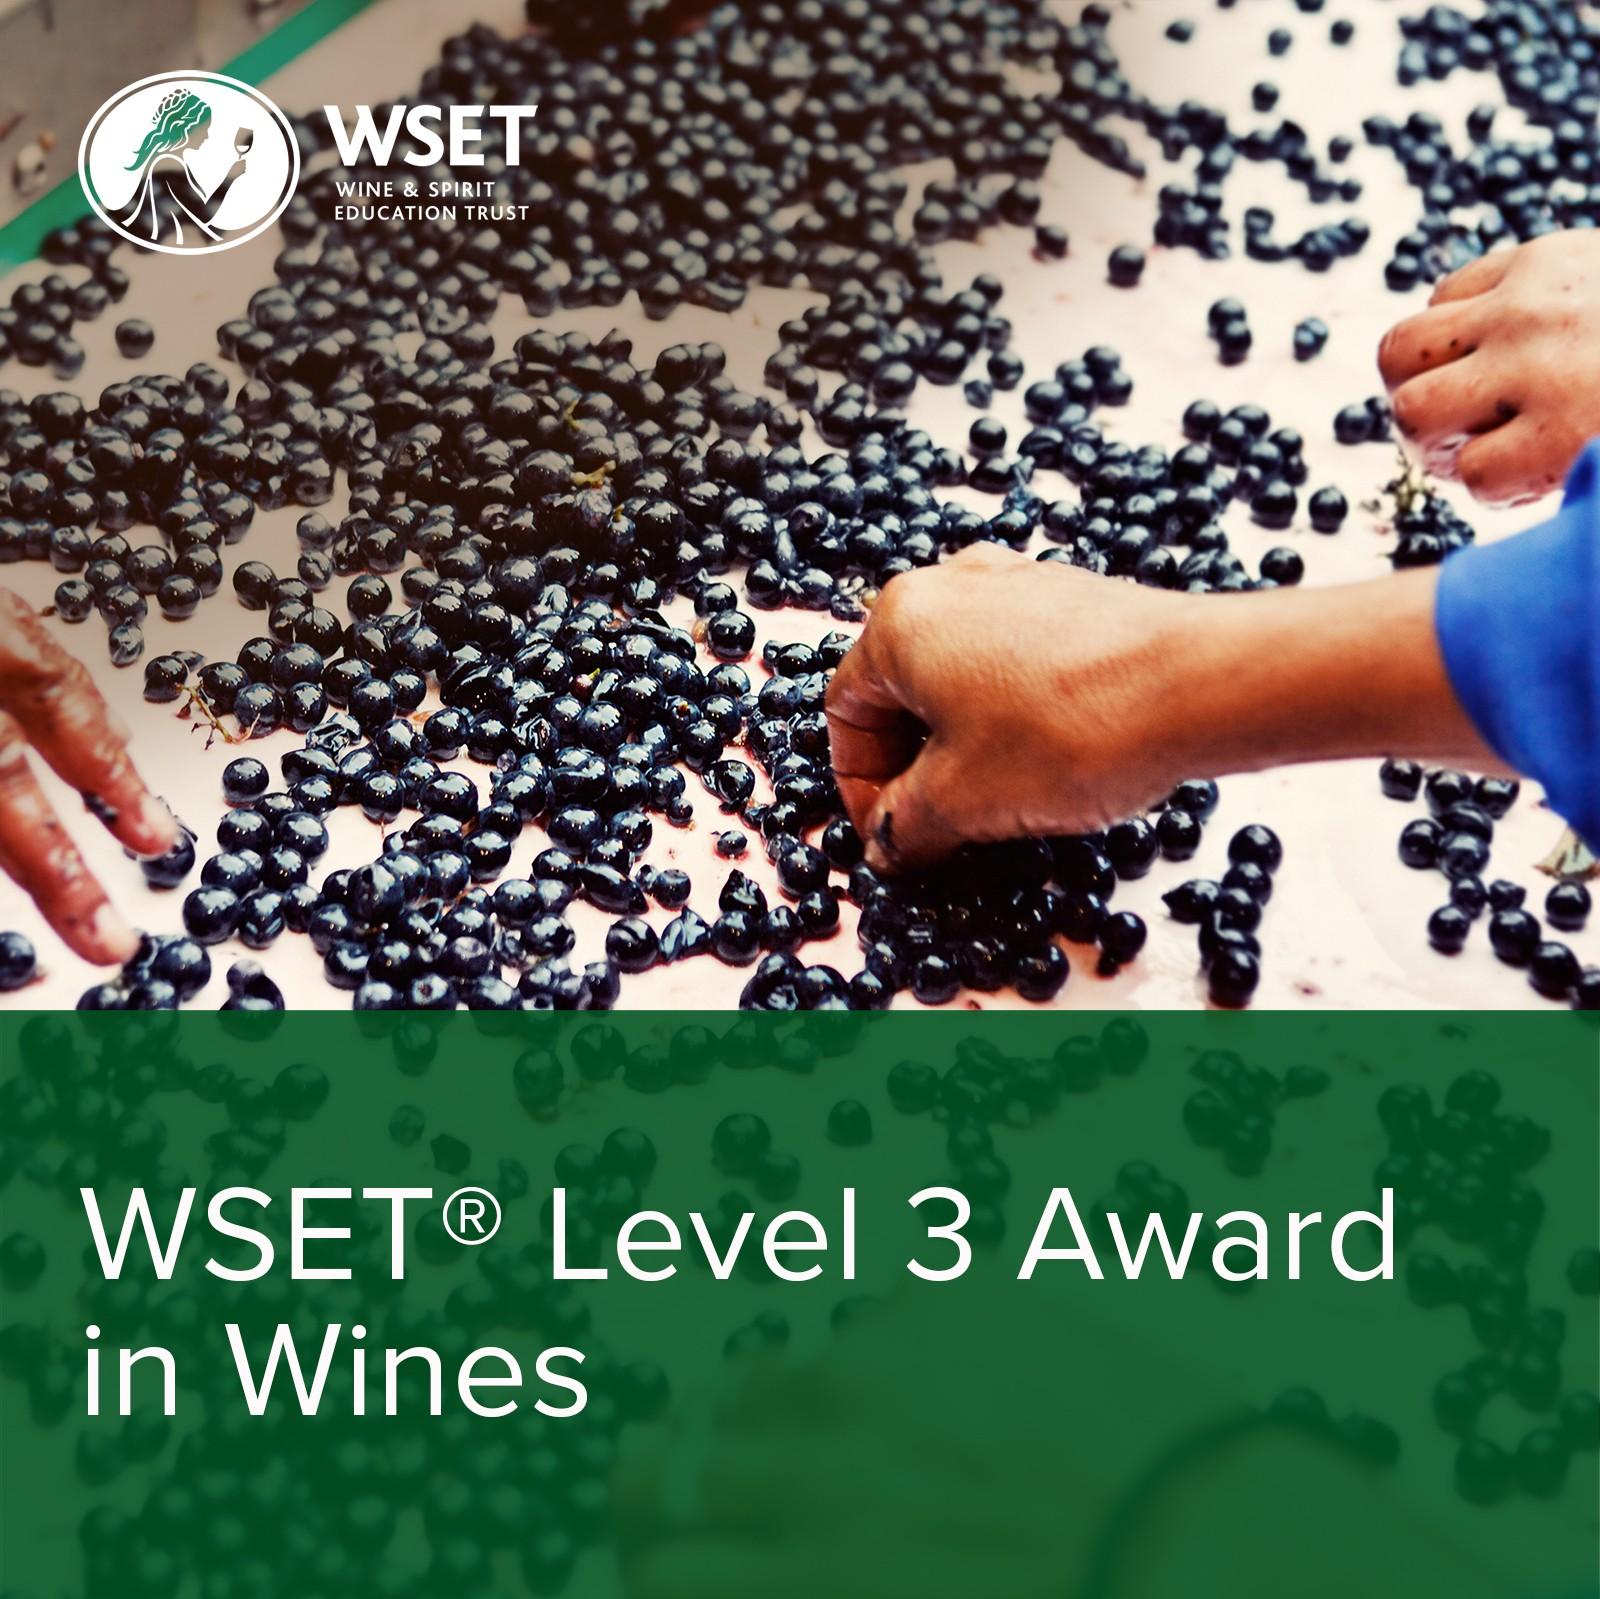 WSET Level 3 Award in Wines - Alexandre MA